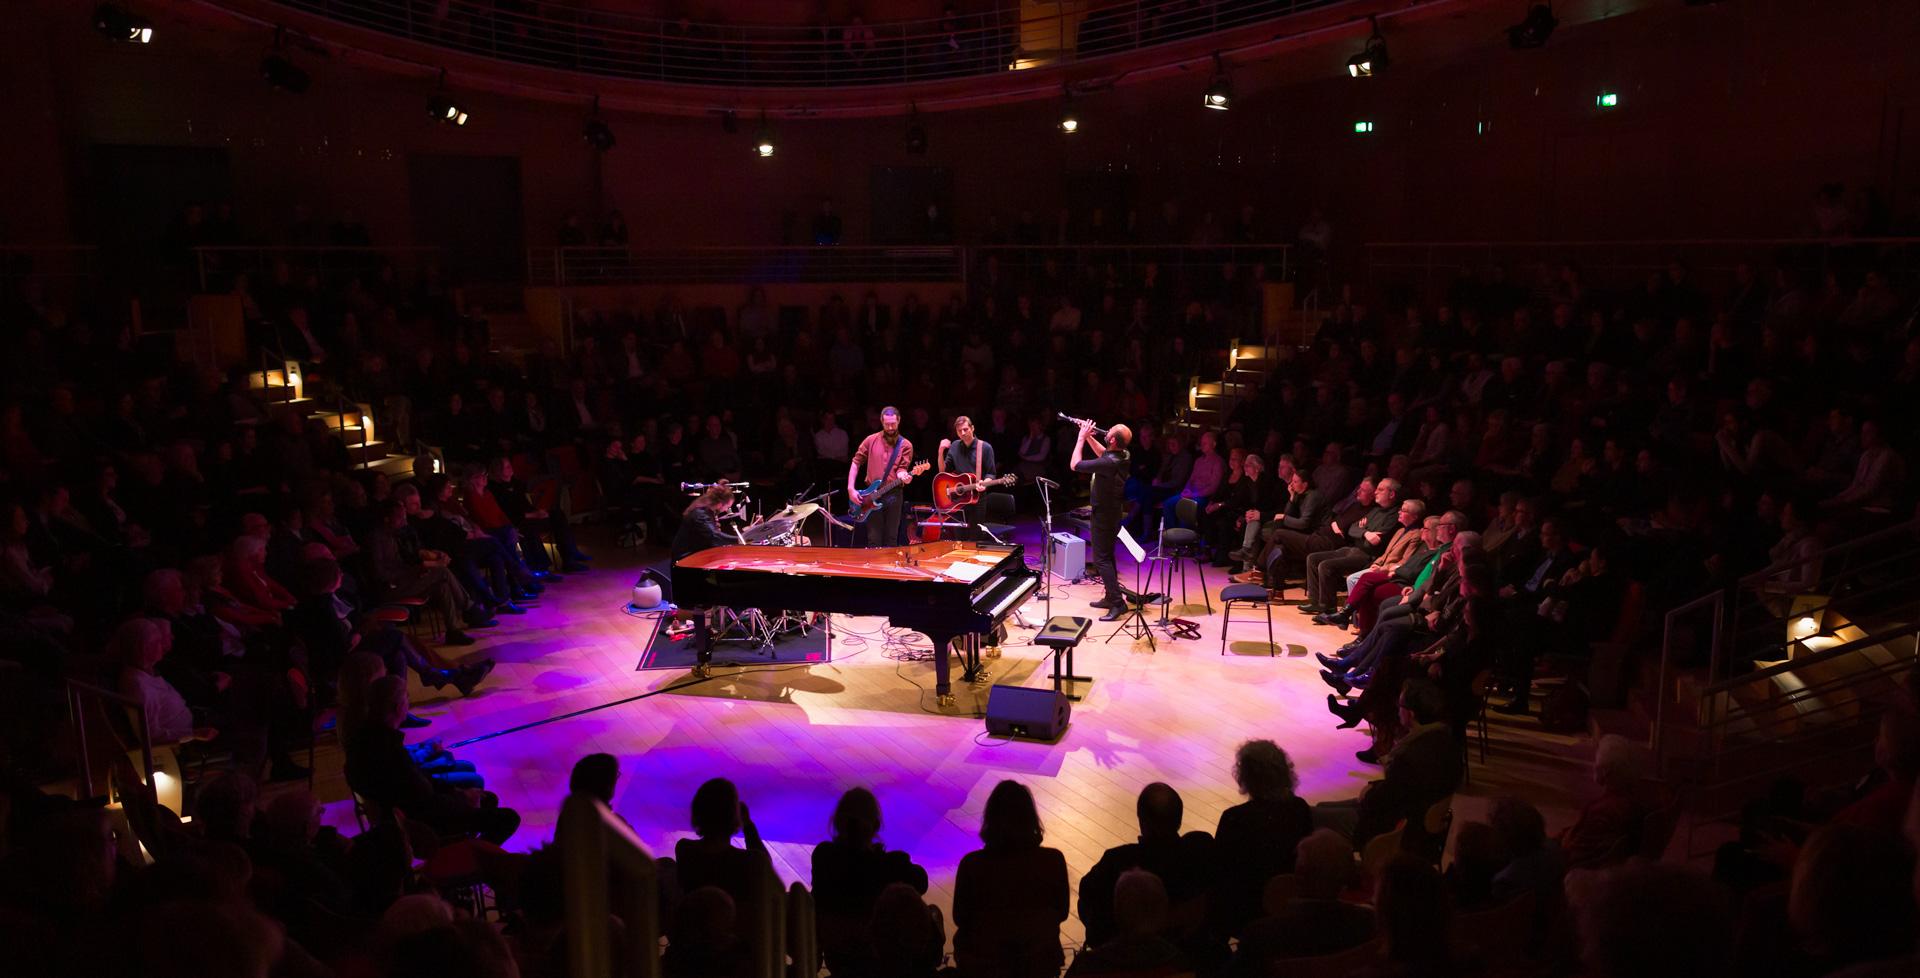 Kinan Azmeh mit seiner New Yorker City Band im Berliner Boulez Saal